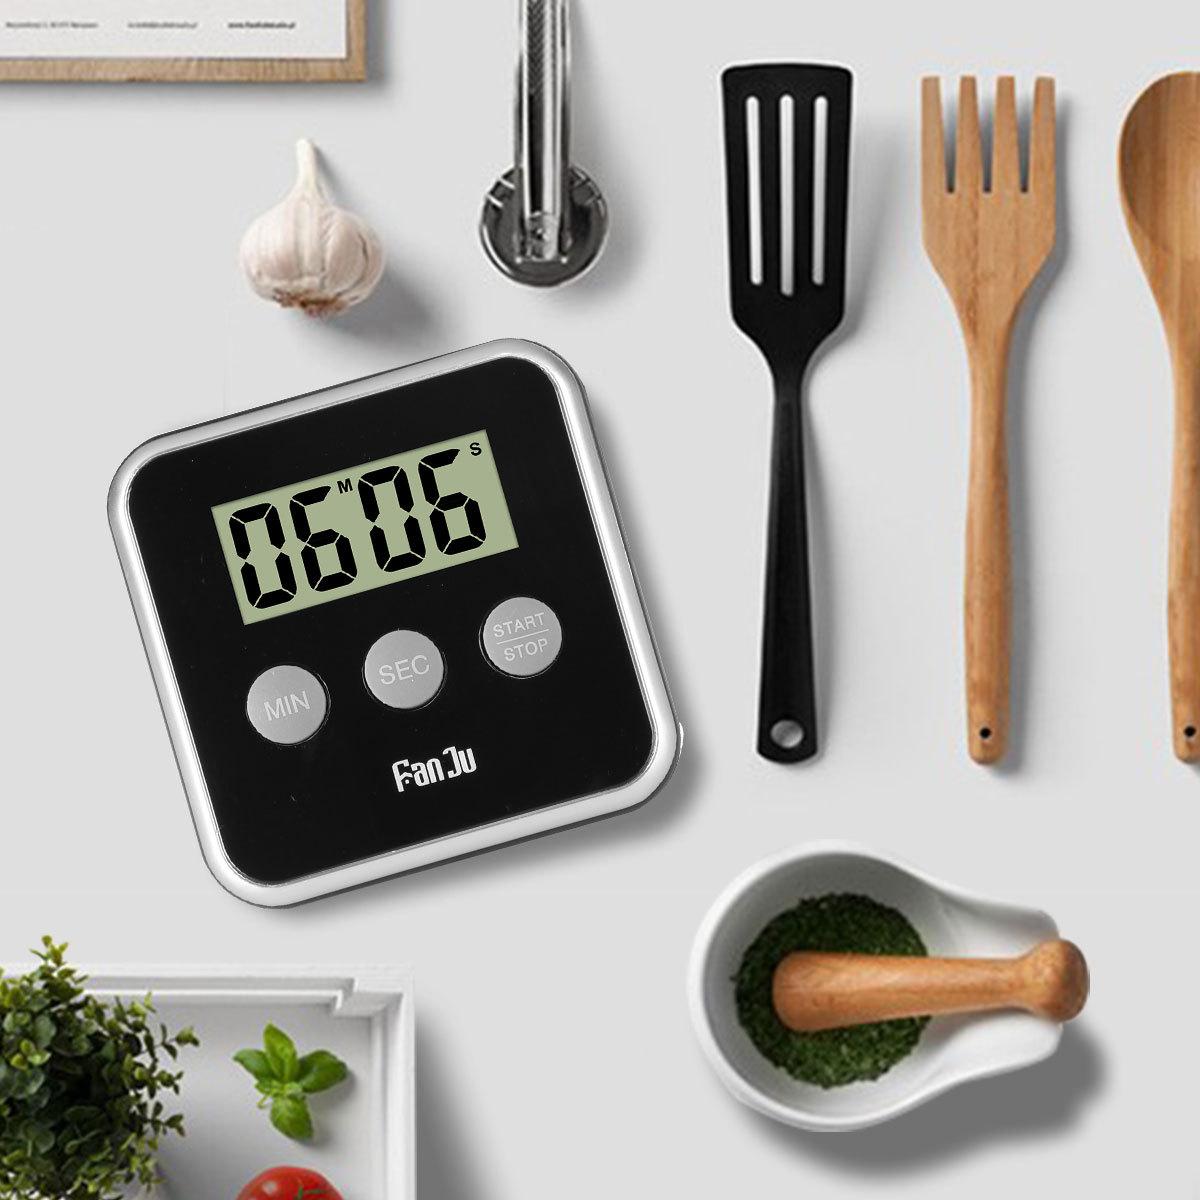 FanJu FJ231 Digital Kitchen Timer, Big Display, Loud Alarm, Magnetic ...